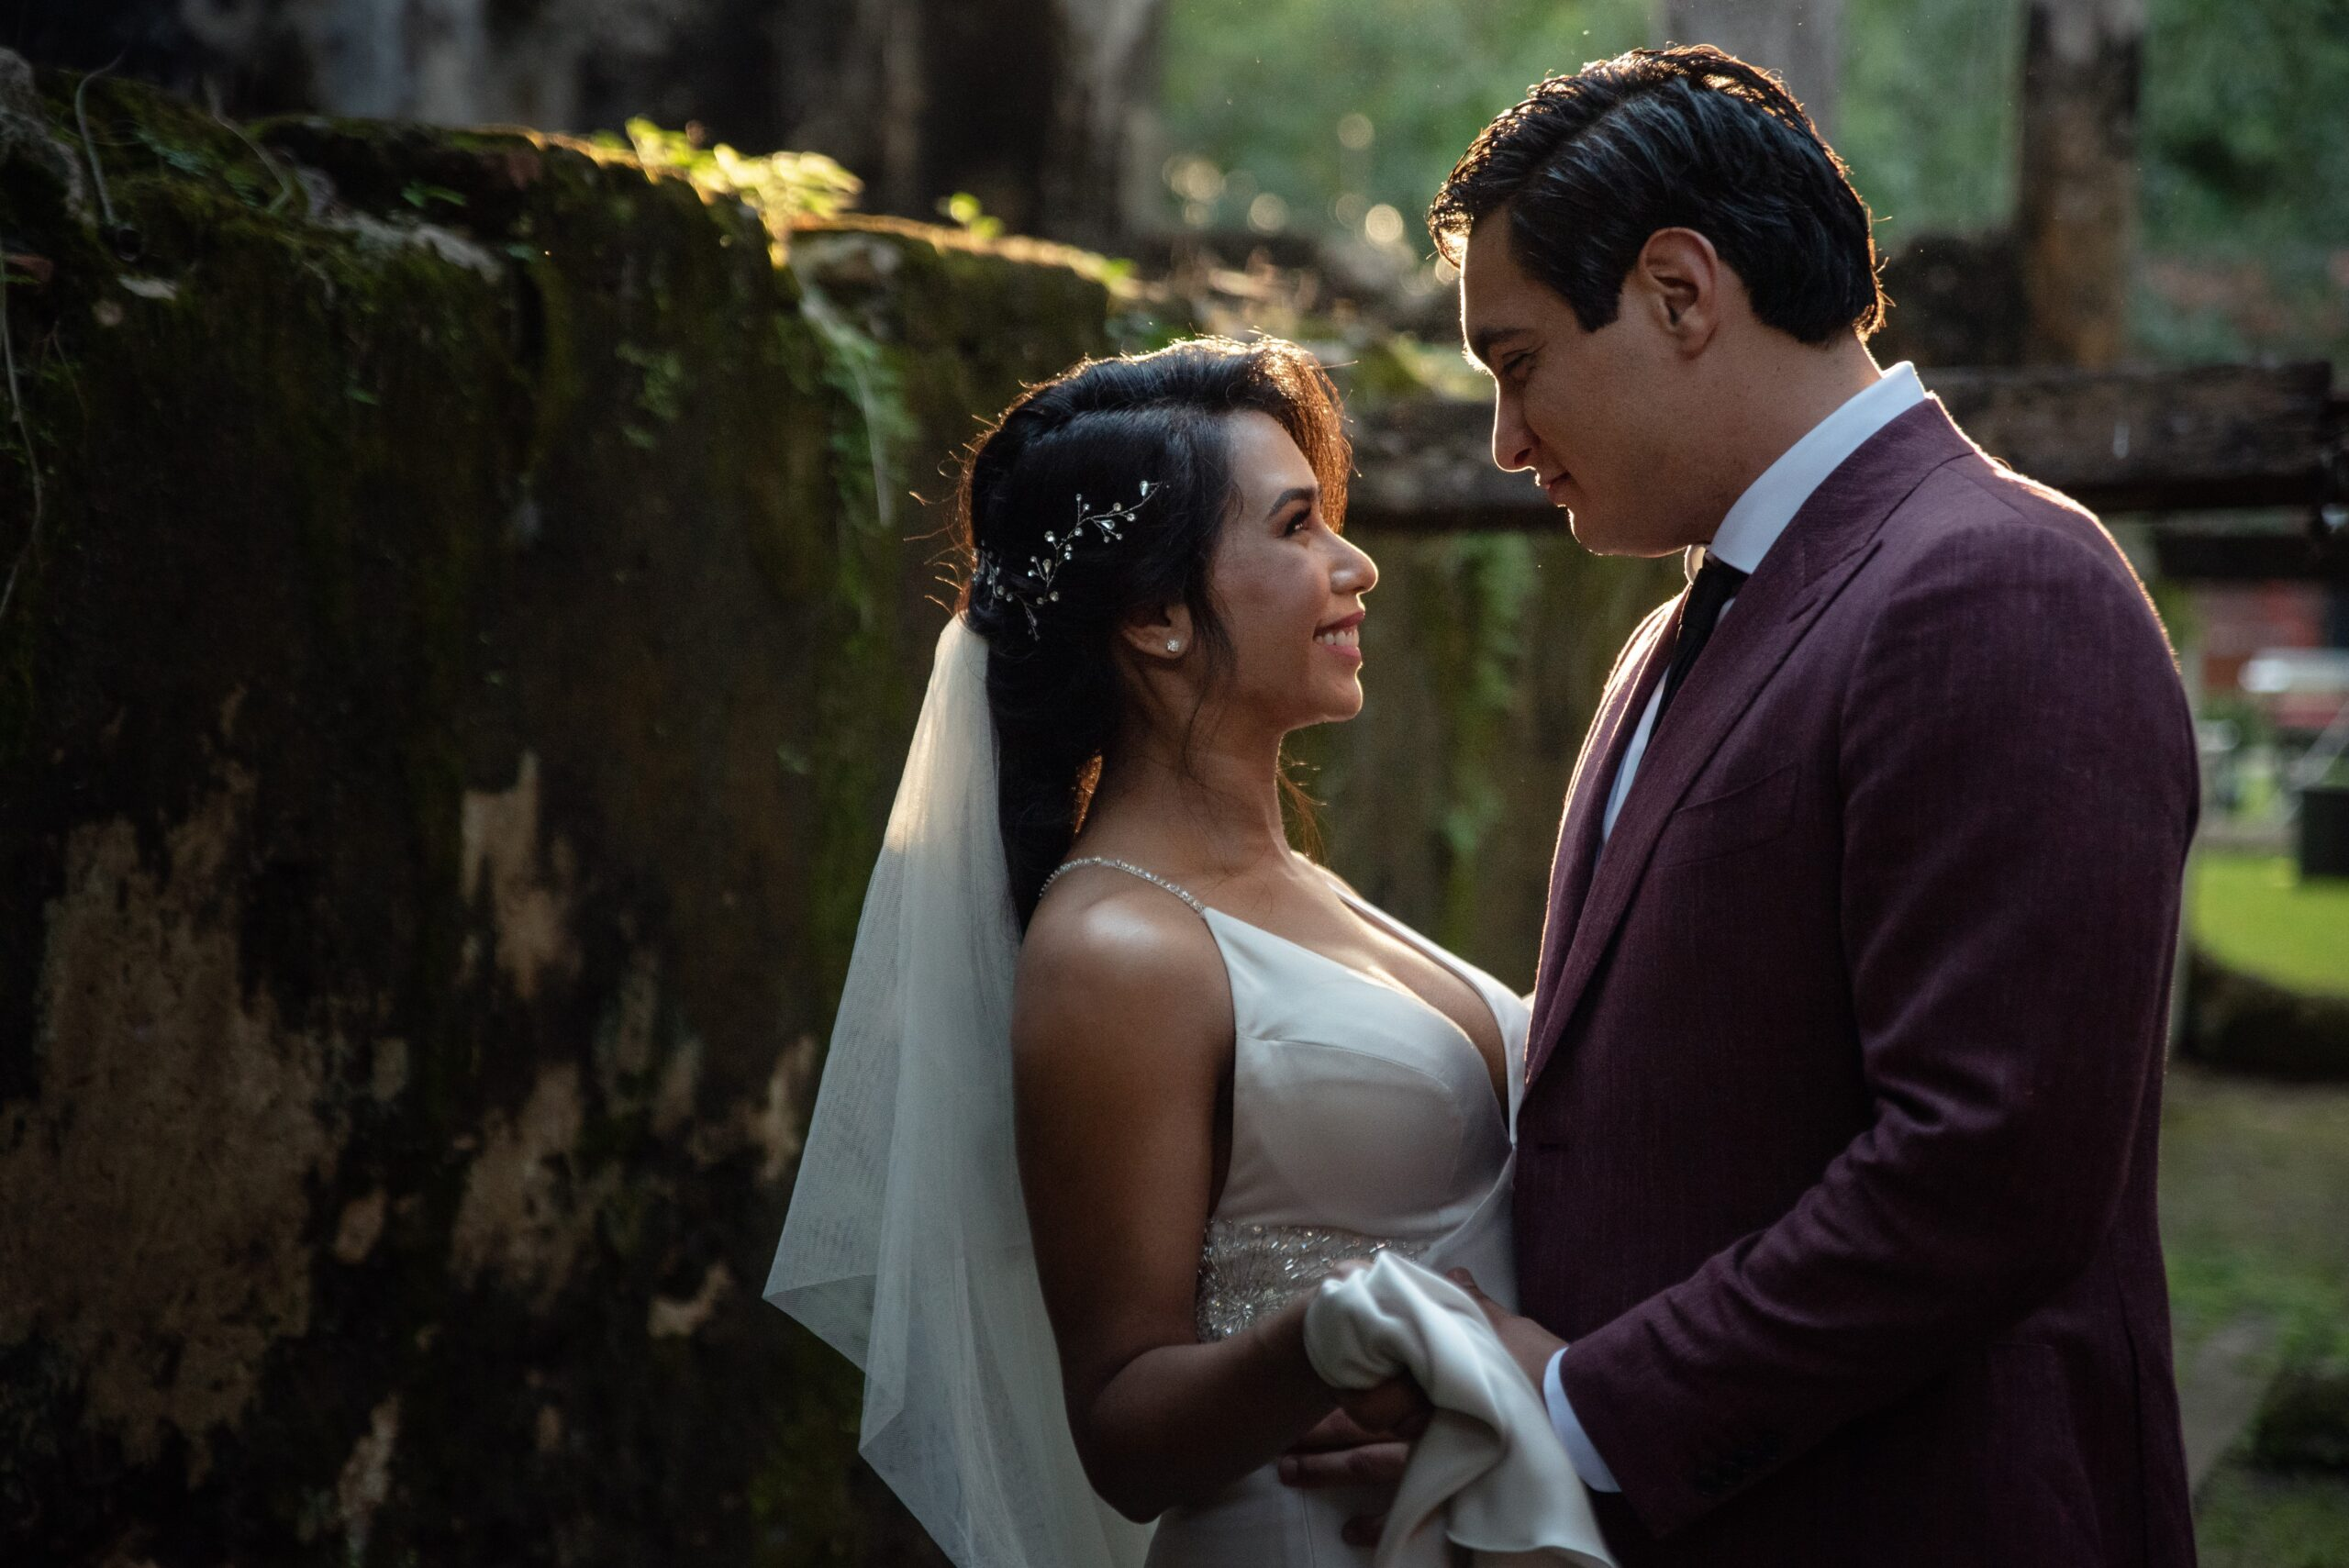 San Antonio Weddings couple, Raquel and Christian, destination wedding in the Mexican Jungle